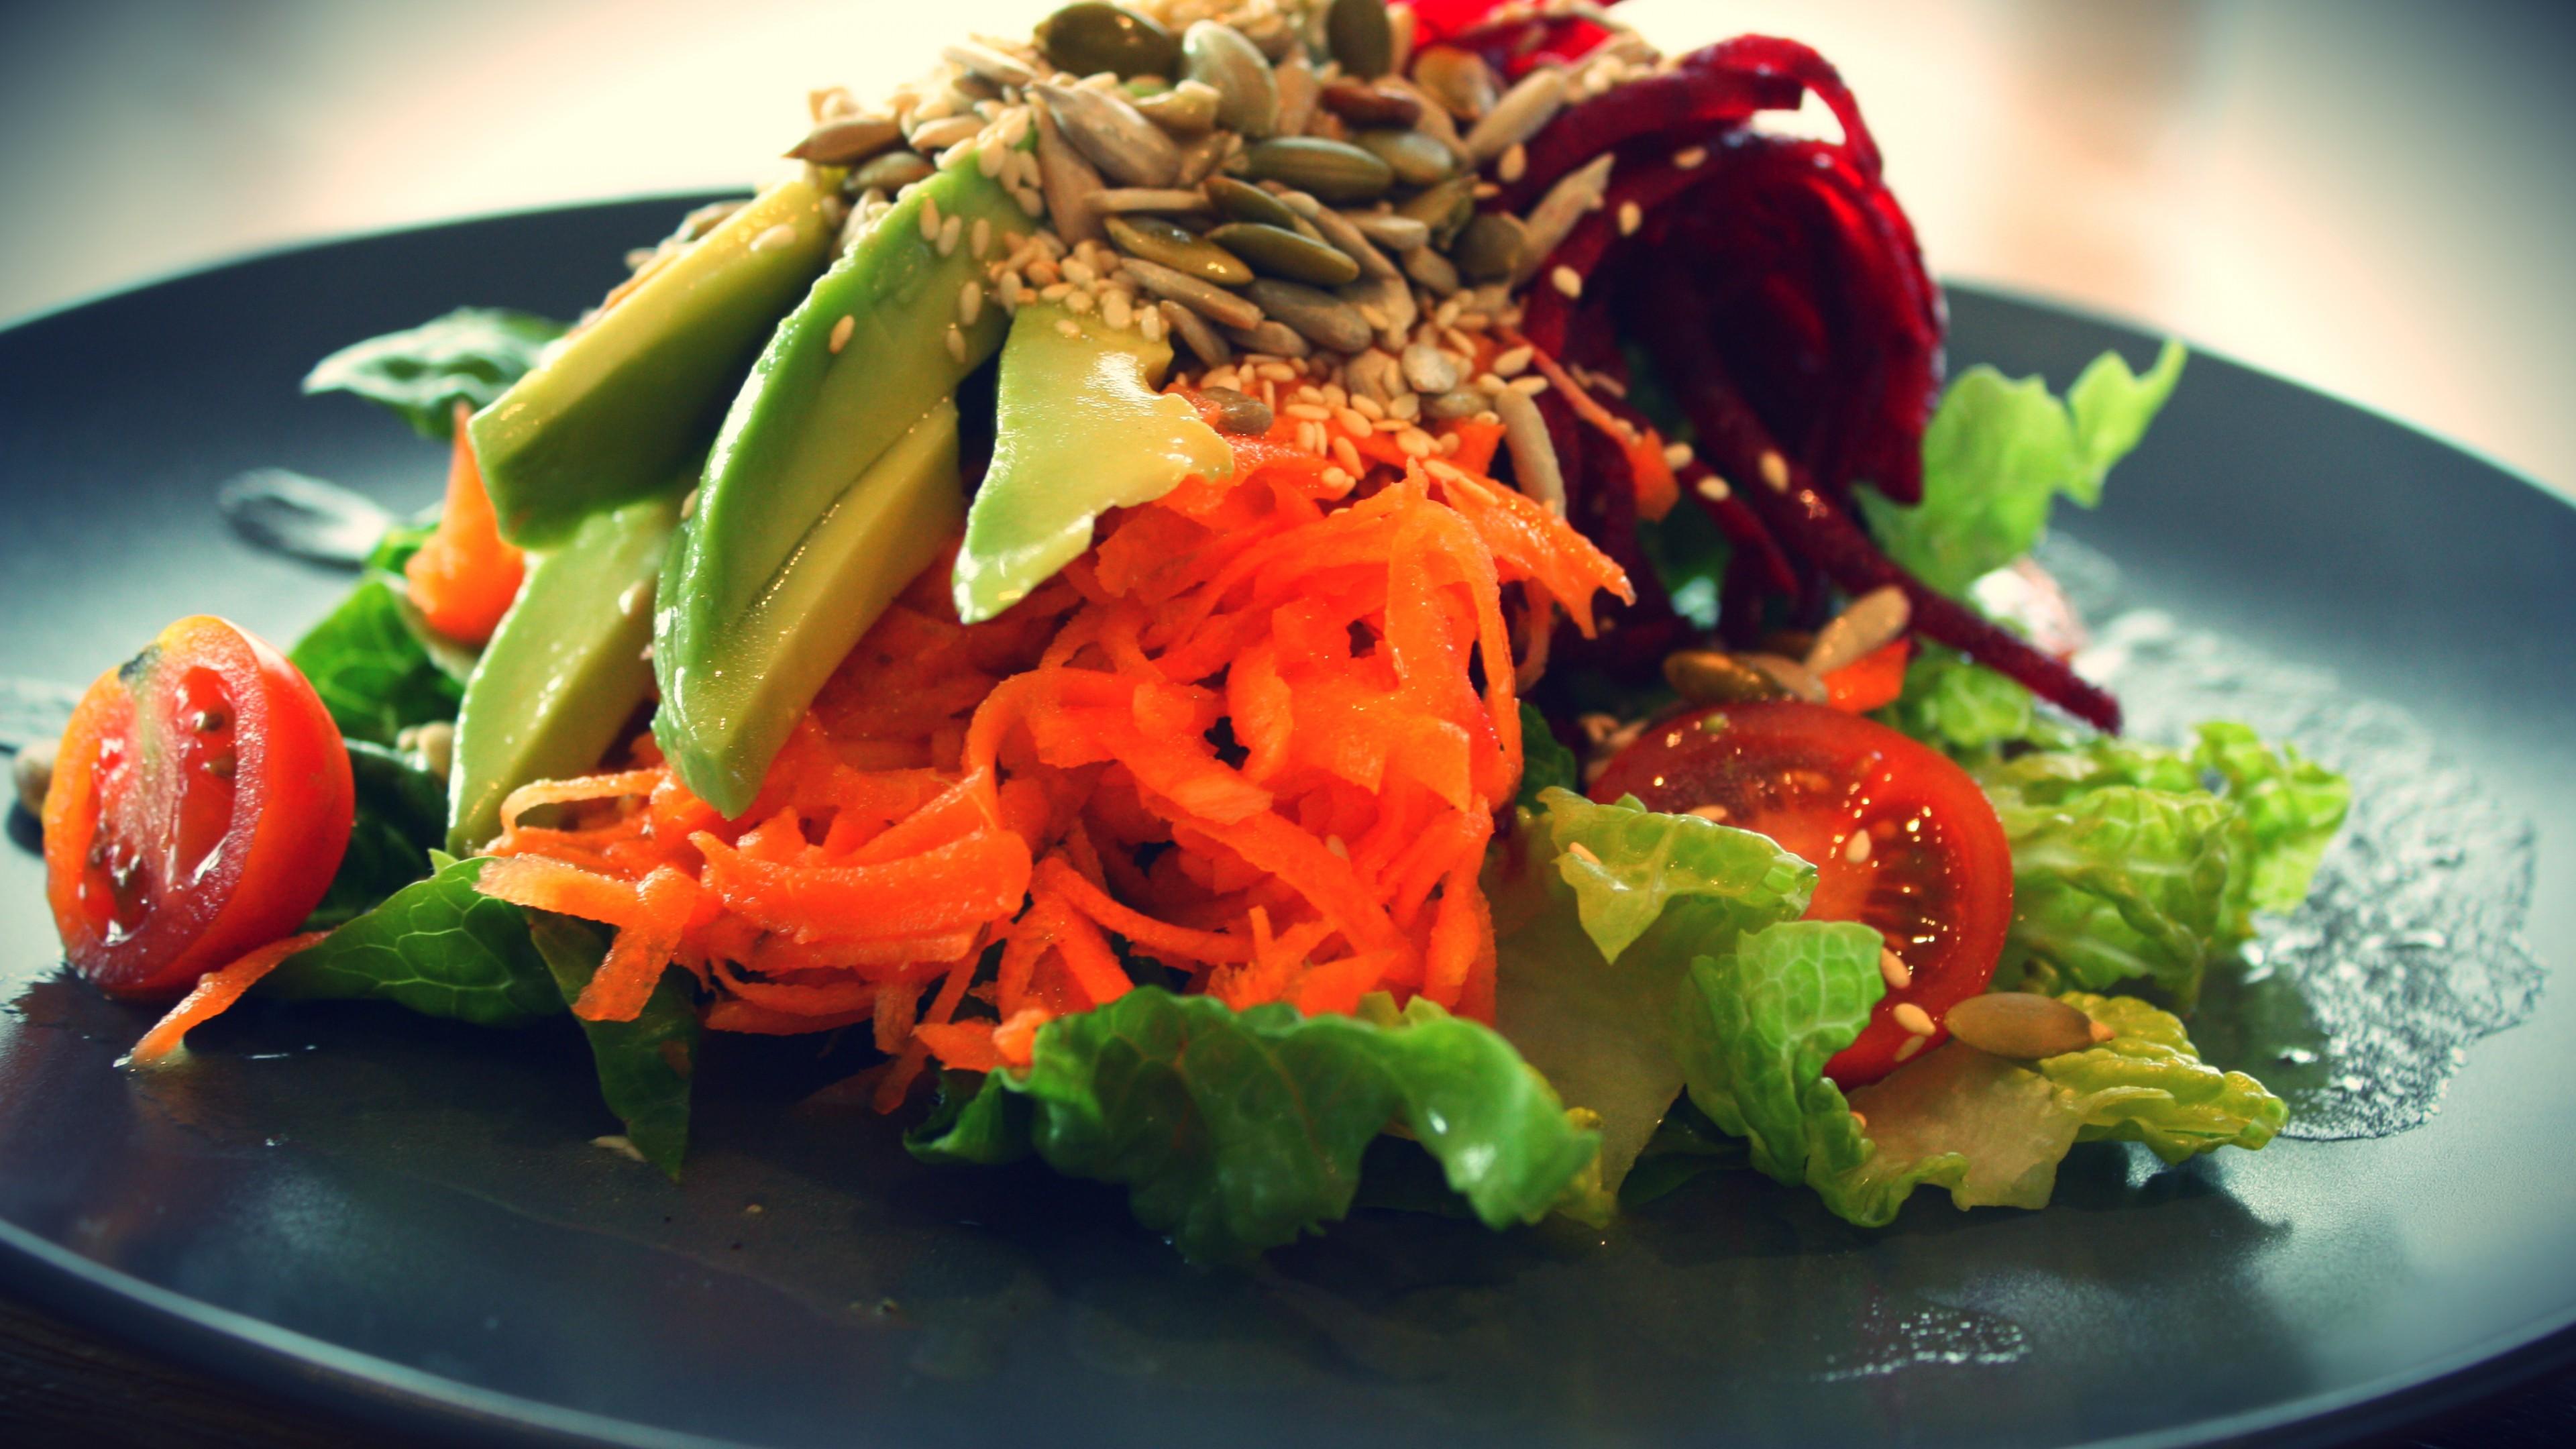 Wallpaper Vegetarian Cooking Recipe Seeds Lettuce Avocado Carrot Beet Cherry Tomatoes Food 946